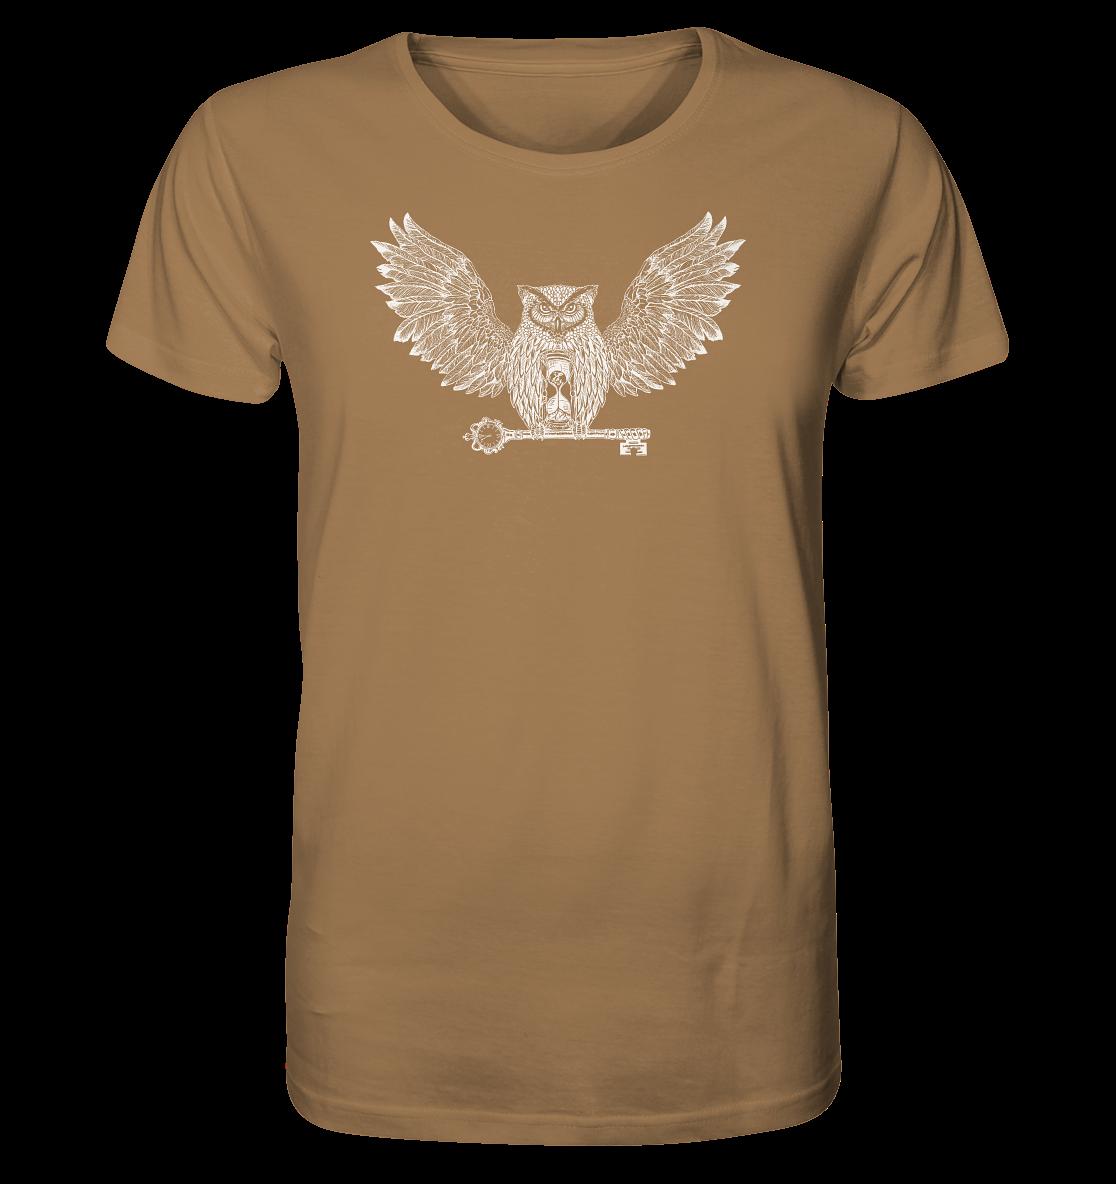 front-organic-shirt-a17c55-1116x-8.png